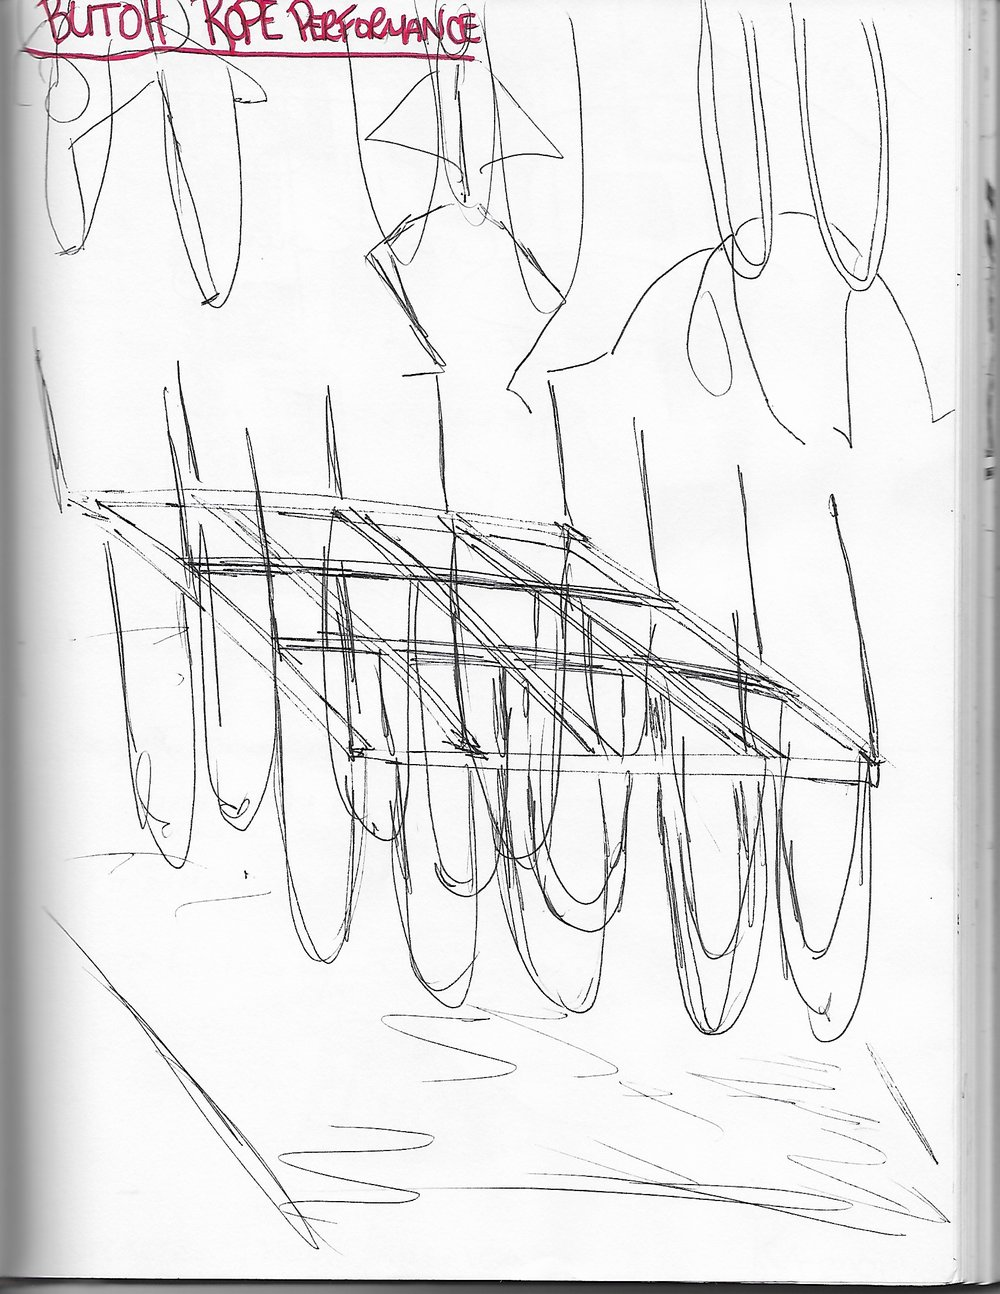 Butoh Rope Performance.jpg